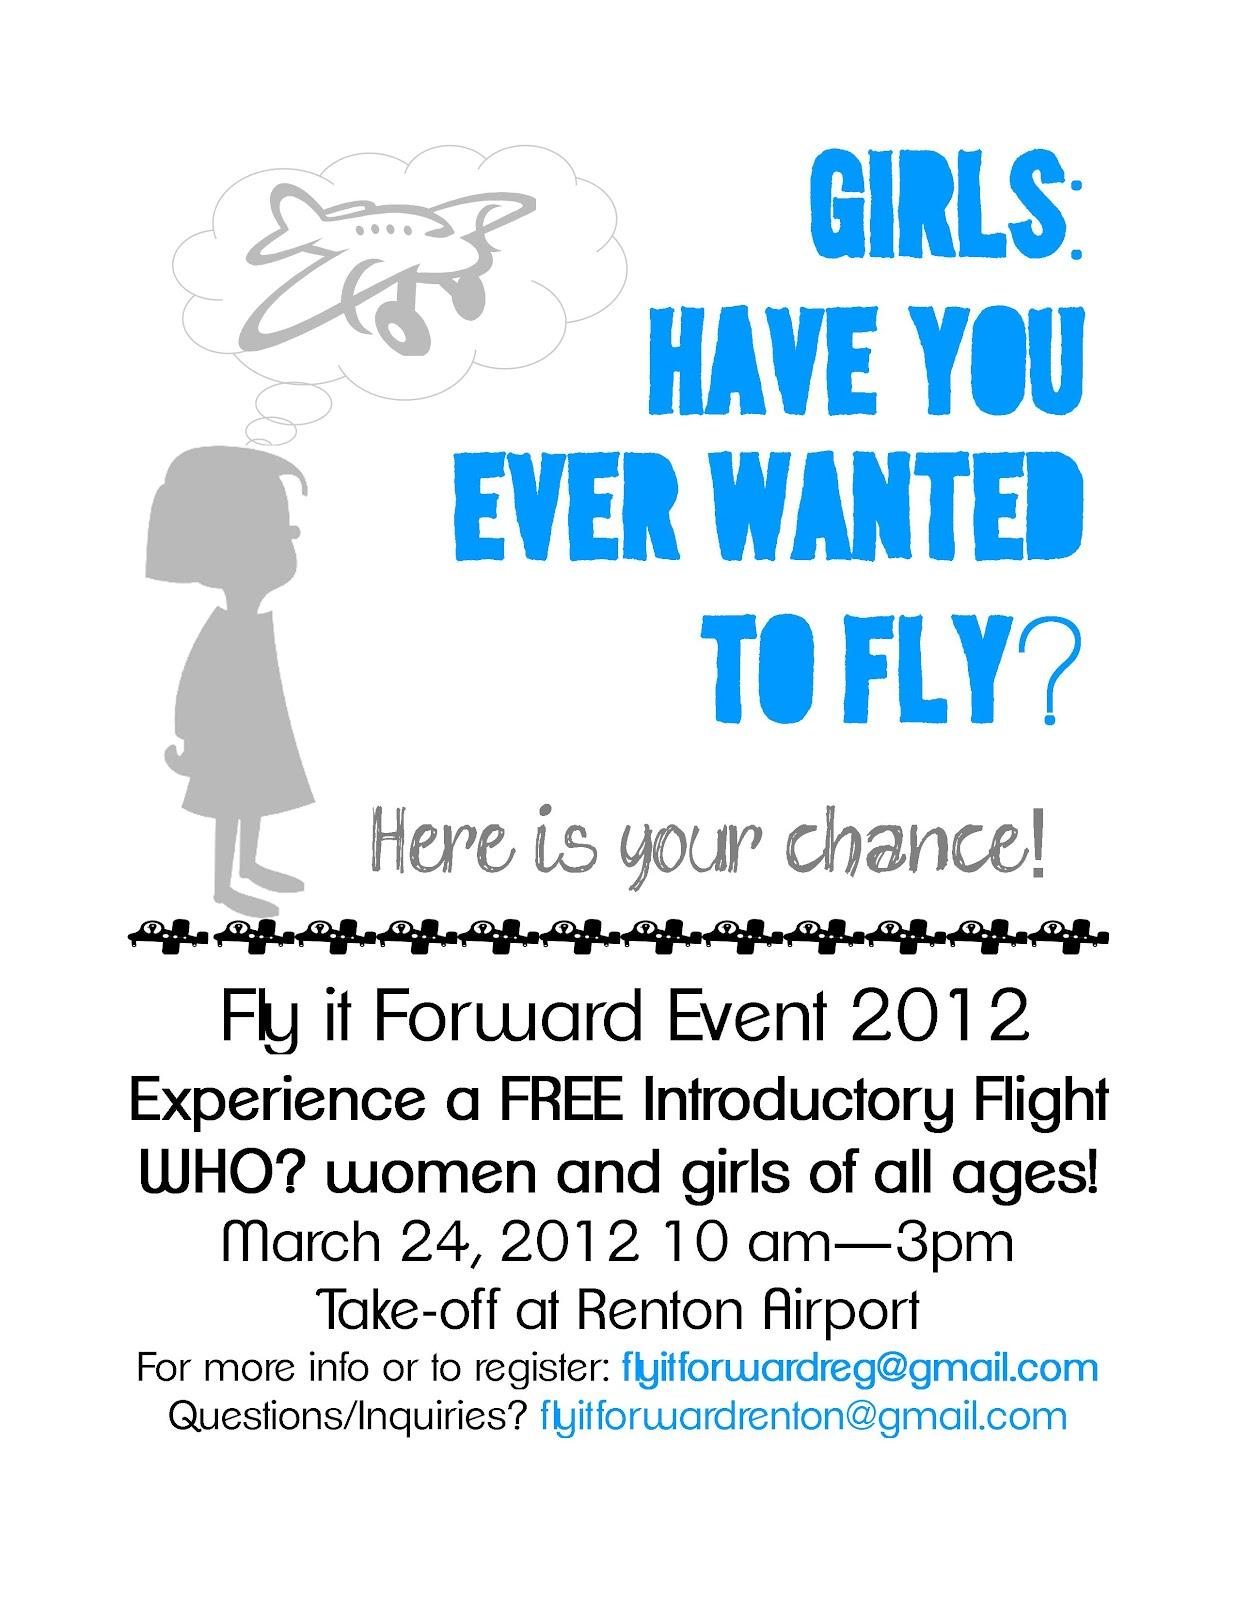 flight to success girls wings flying scholarship thursday 15 2012